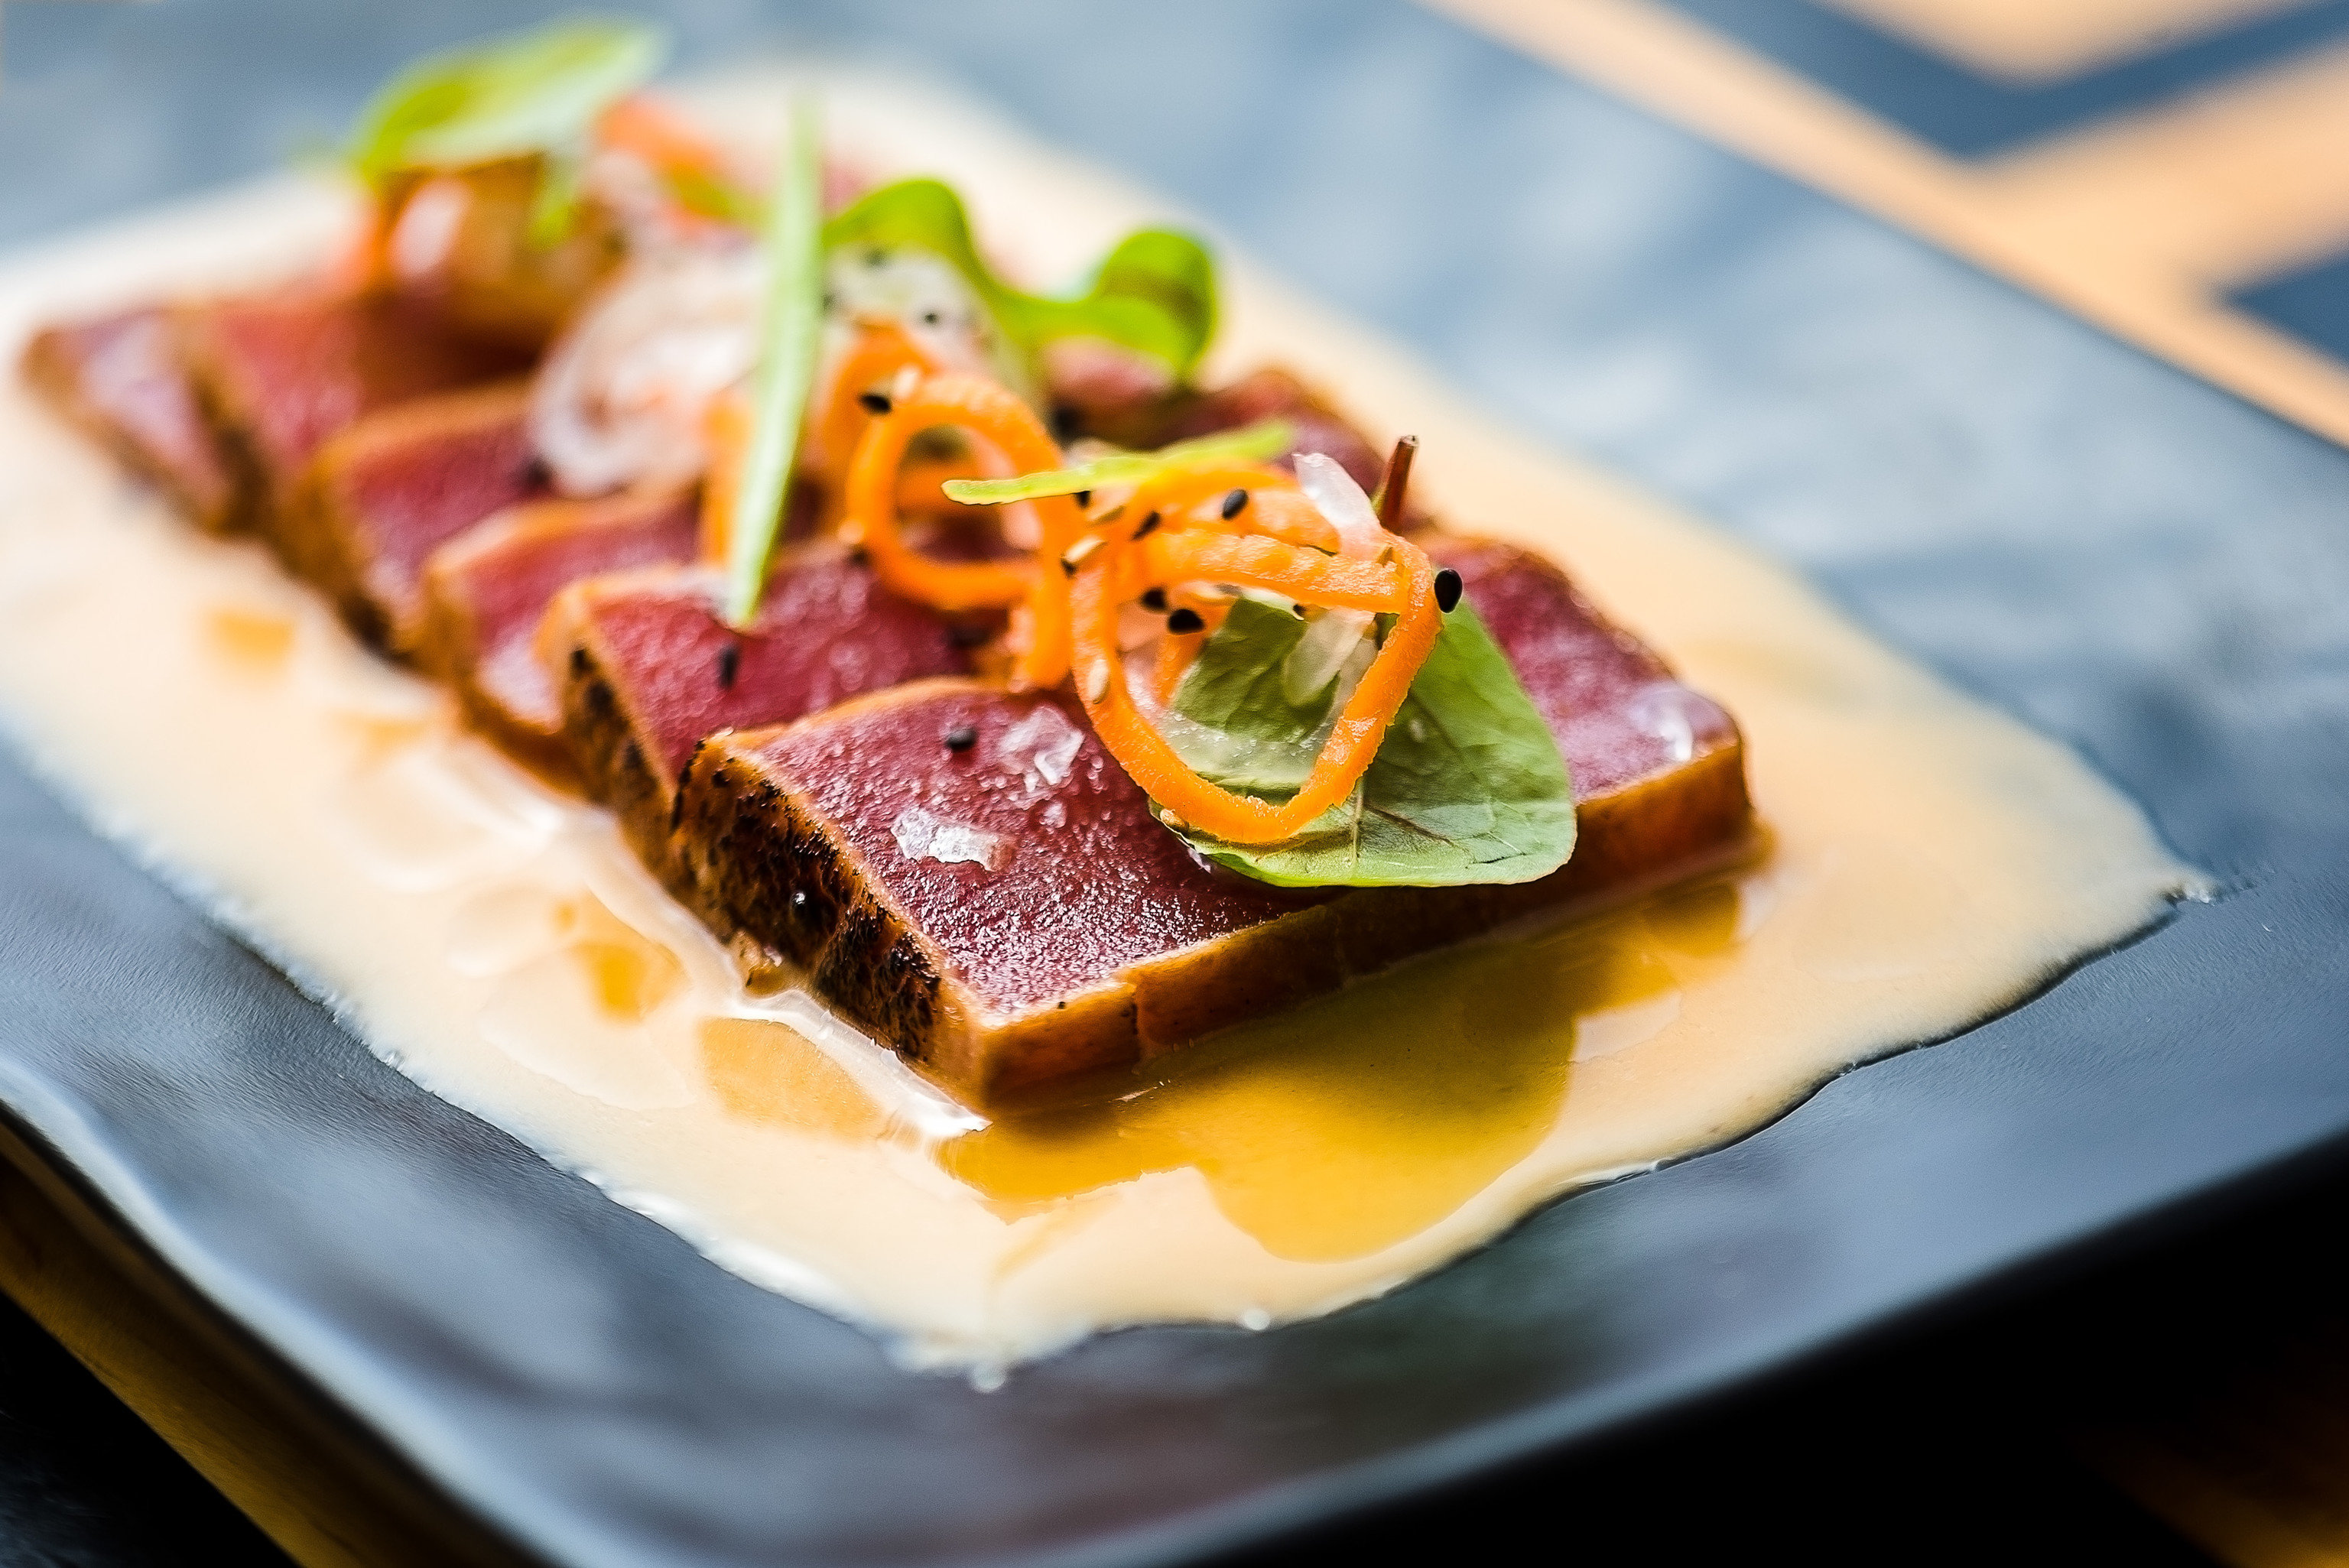 Food + Drink food plate dish cuisine piece appetizer asian food recipe finger food slice dessert square decorated